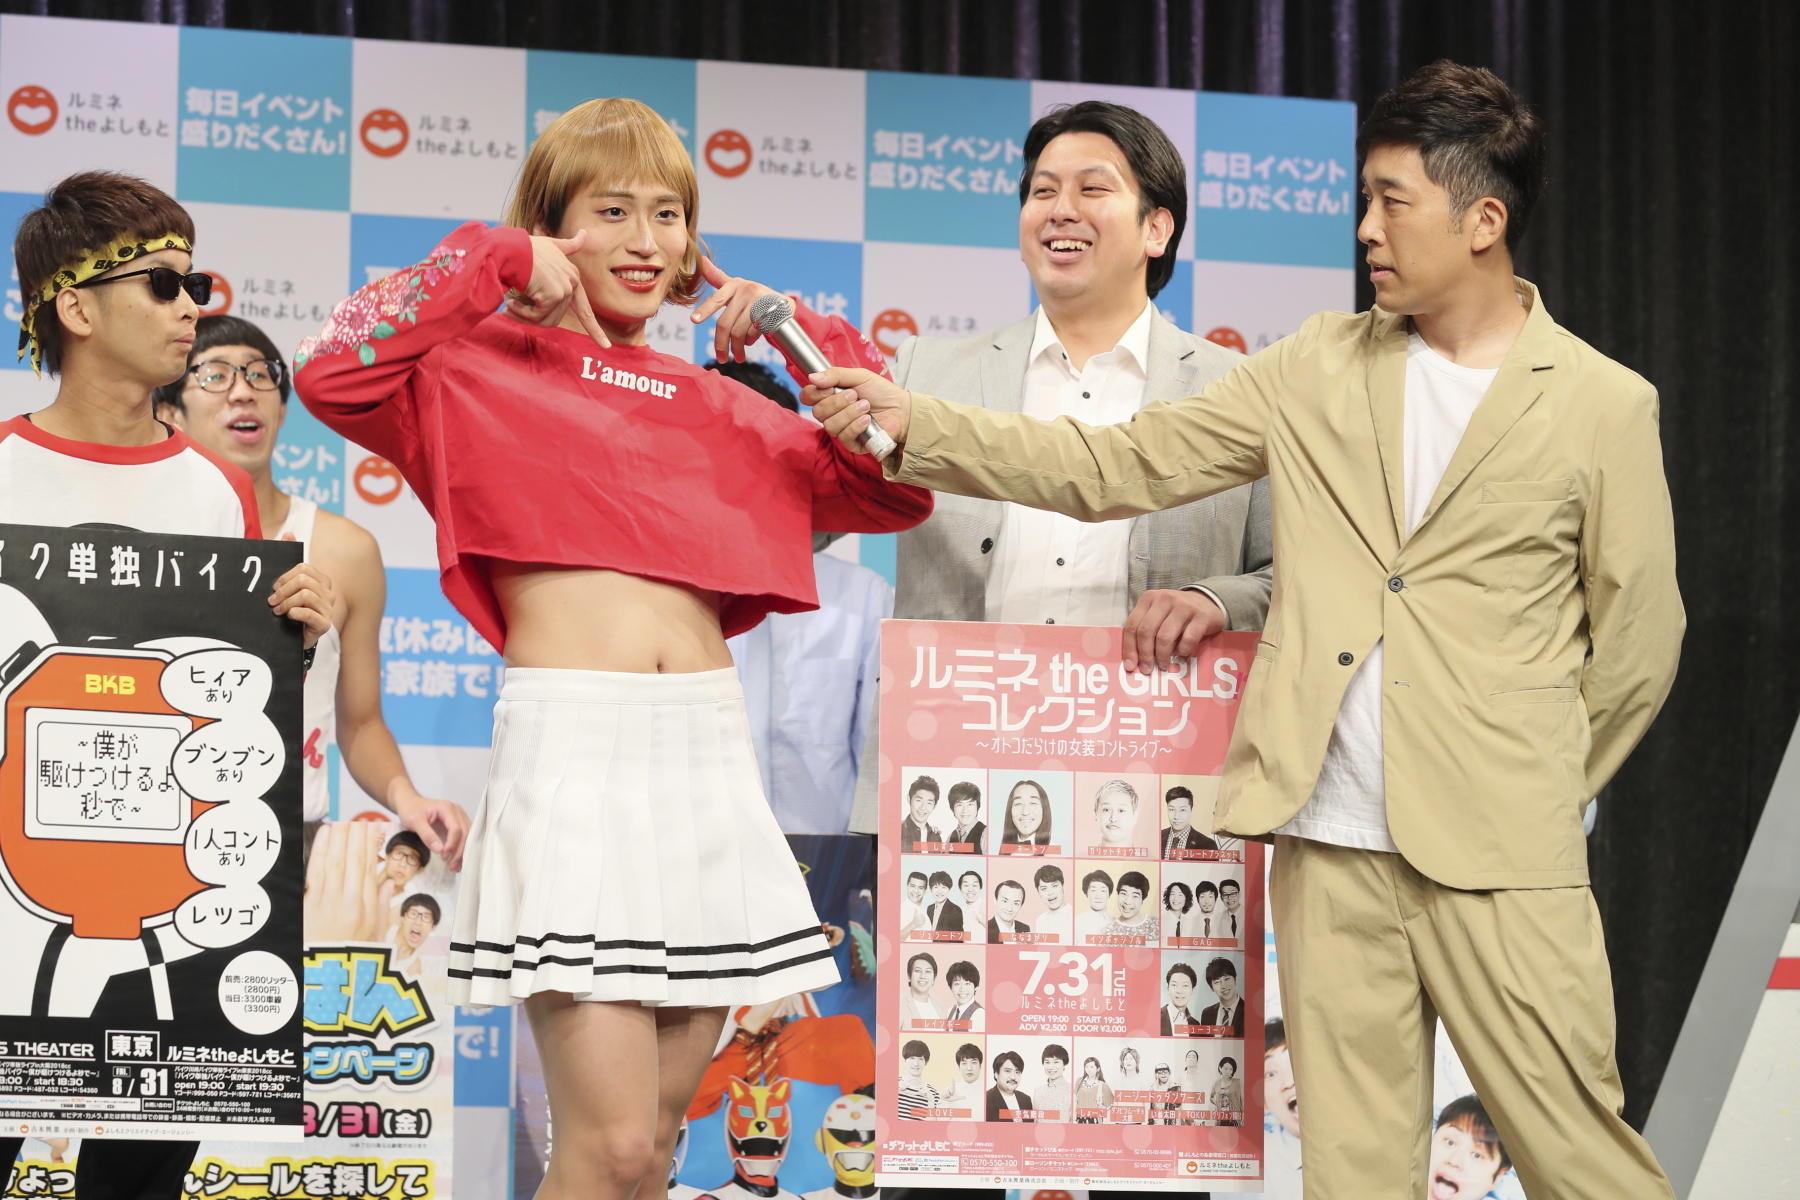 http://news.yoshimoto.co.jp/20180703192500-b67efac651d2465bfa23f3398e9beaf446fe109d.jpg